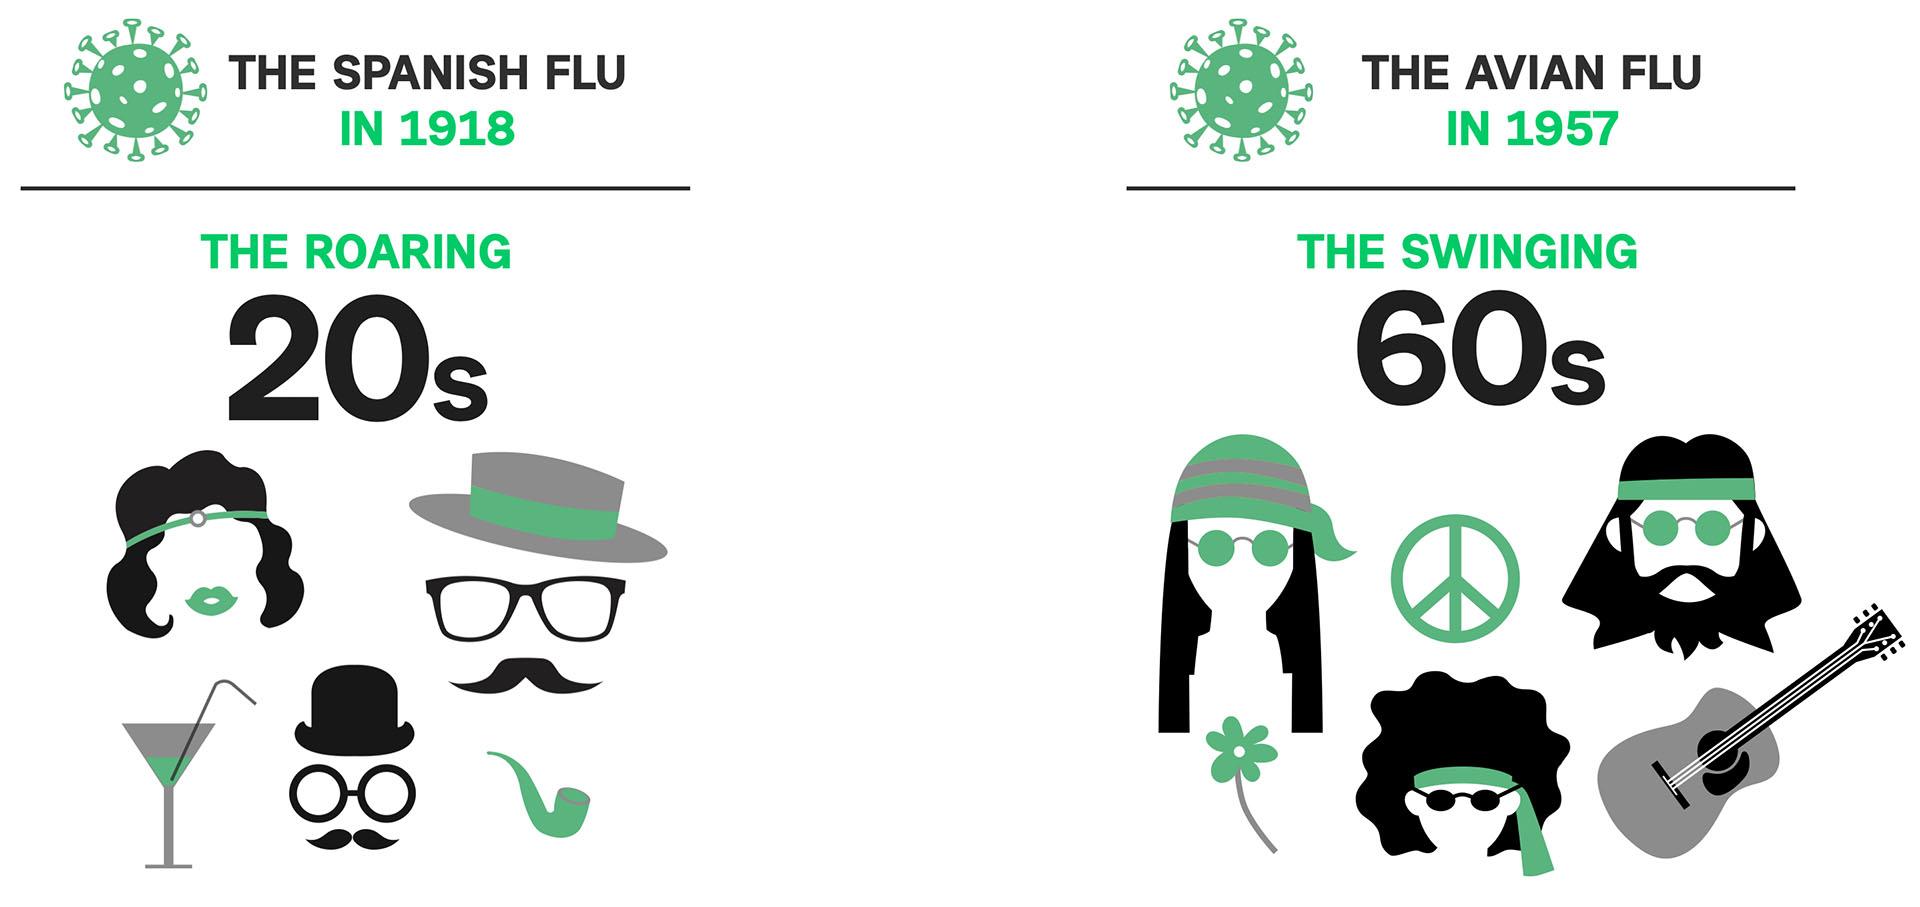 spanish_flu_1918_vs_avian_flu_1957